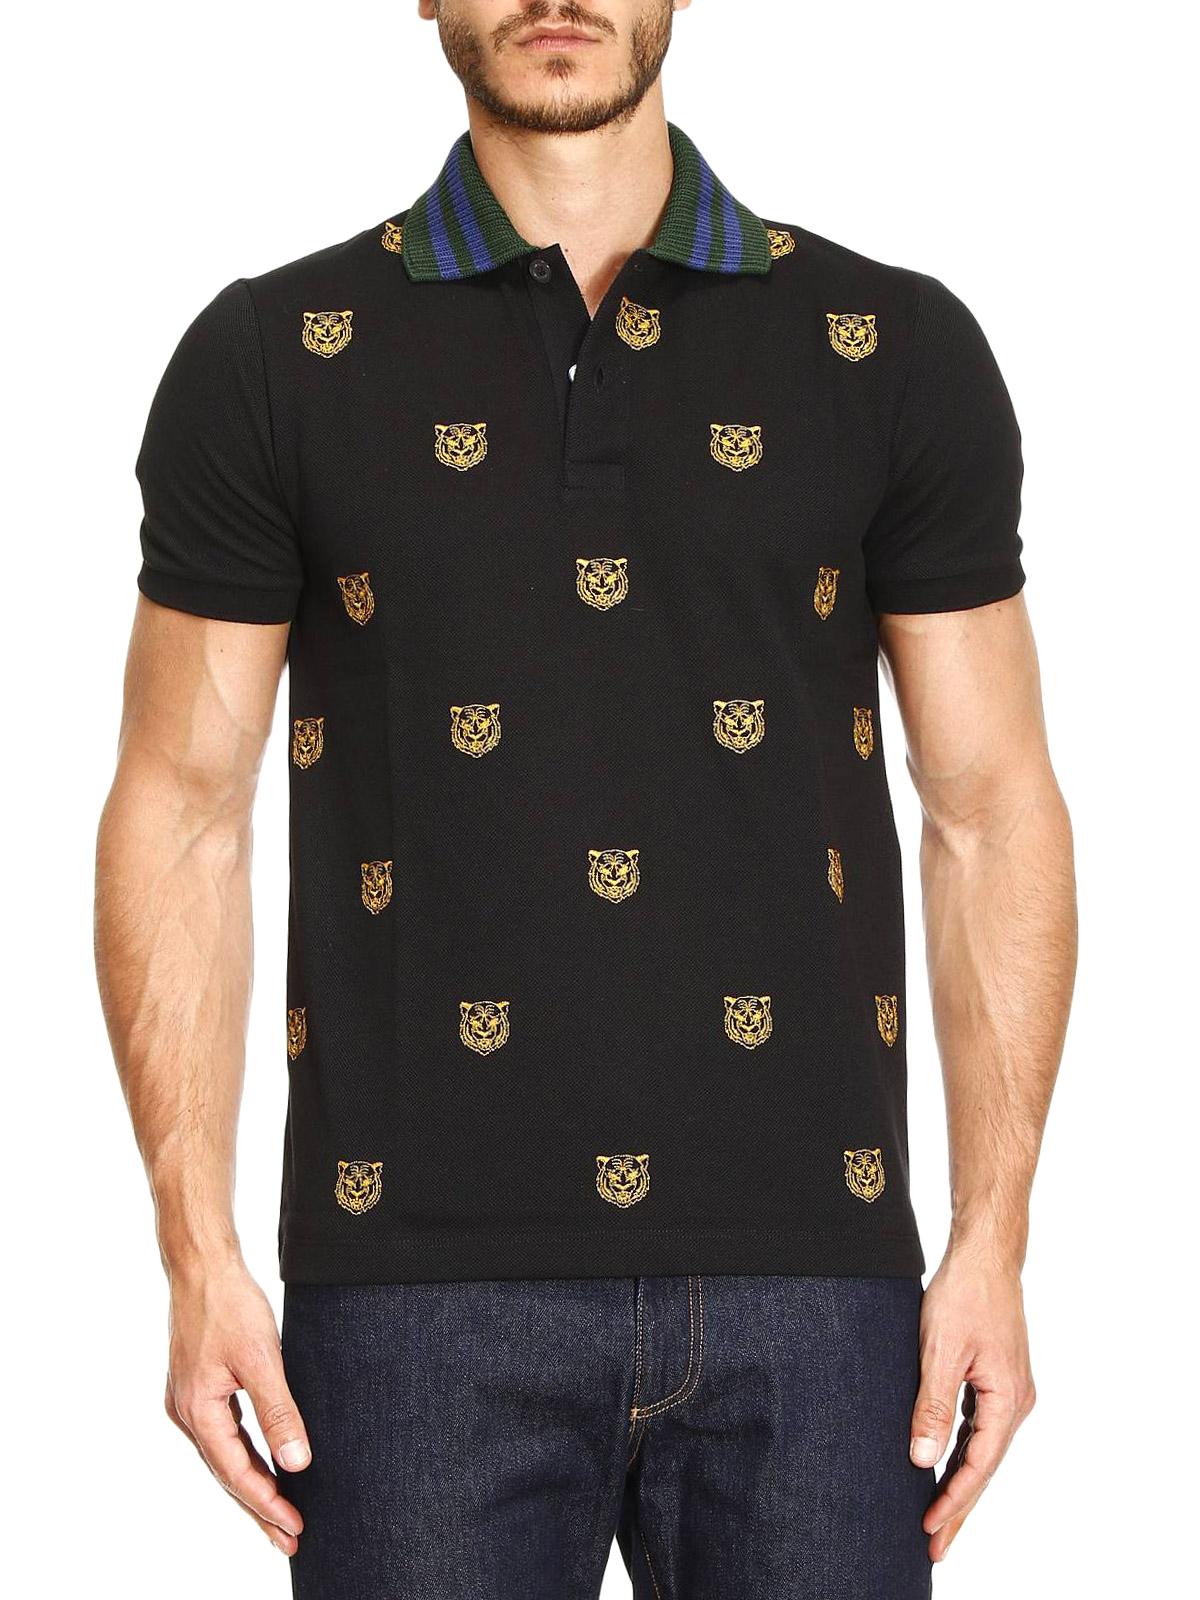 Gucci Tiger Head Embroidered Polo Shirt Polo Shirts 475118